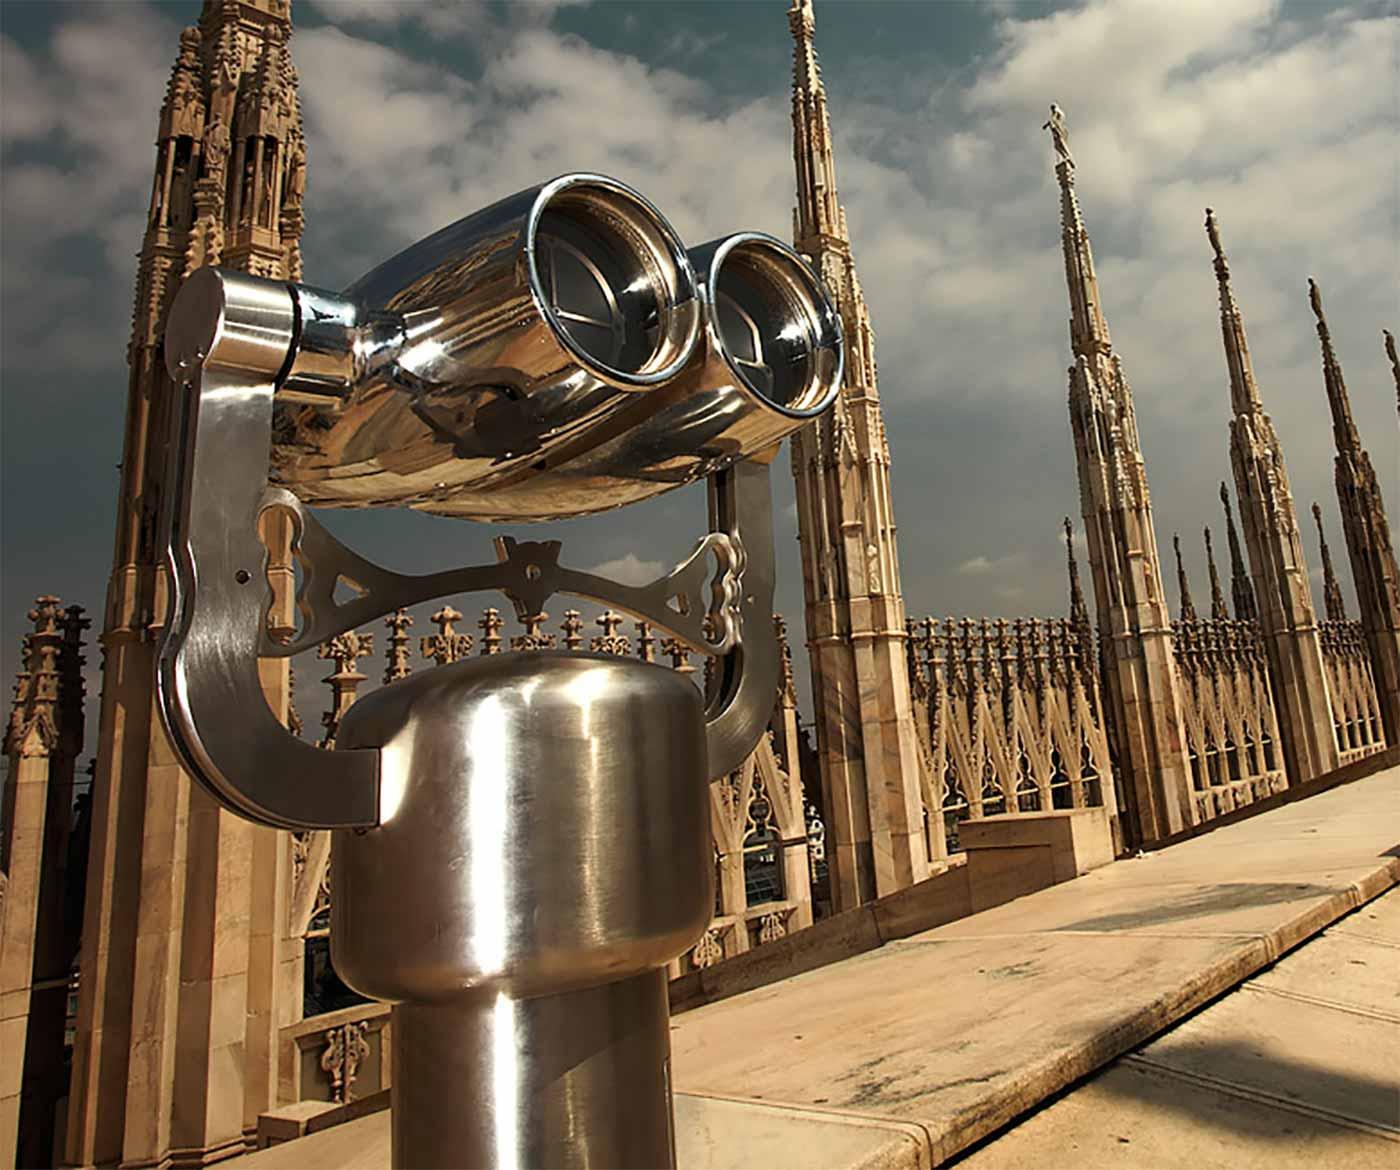 Binoculars at Duomo roof